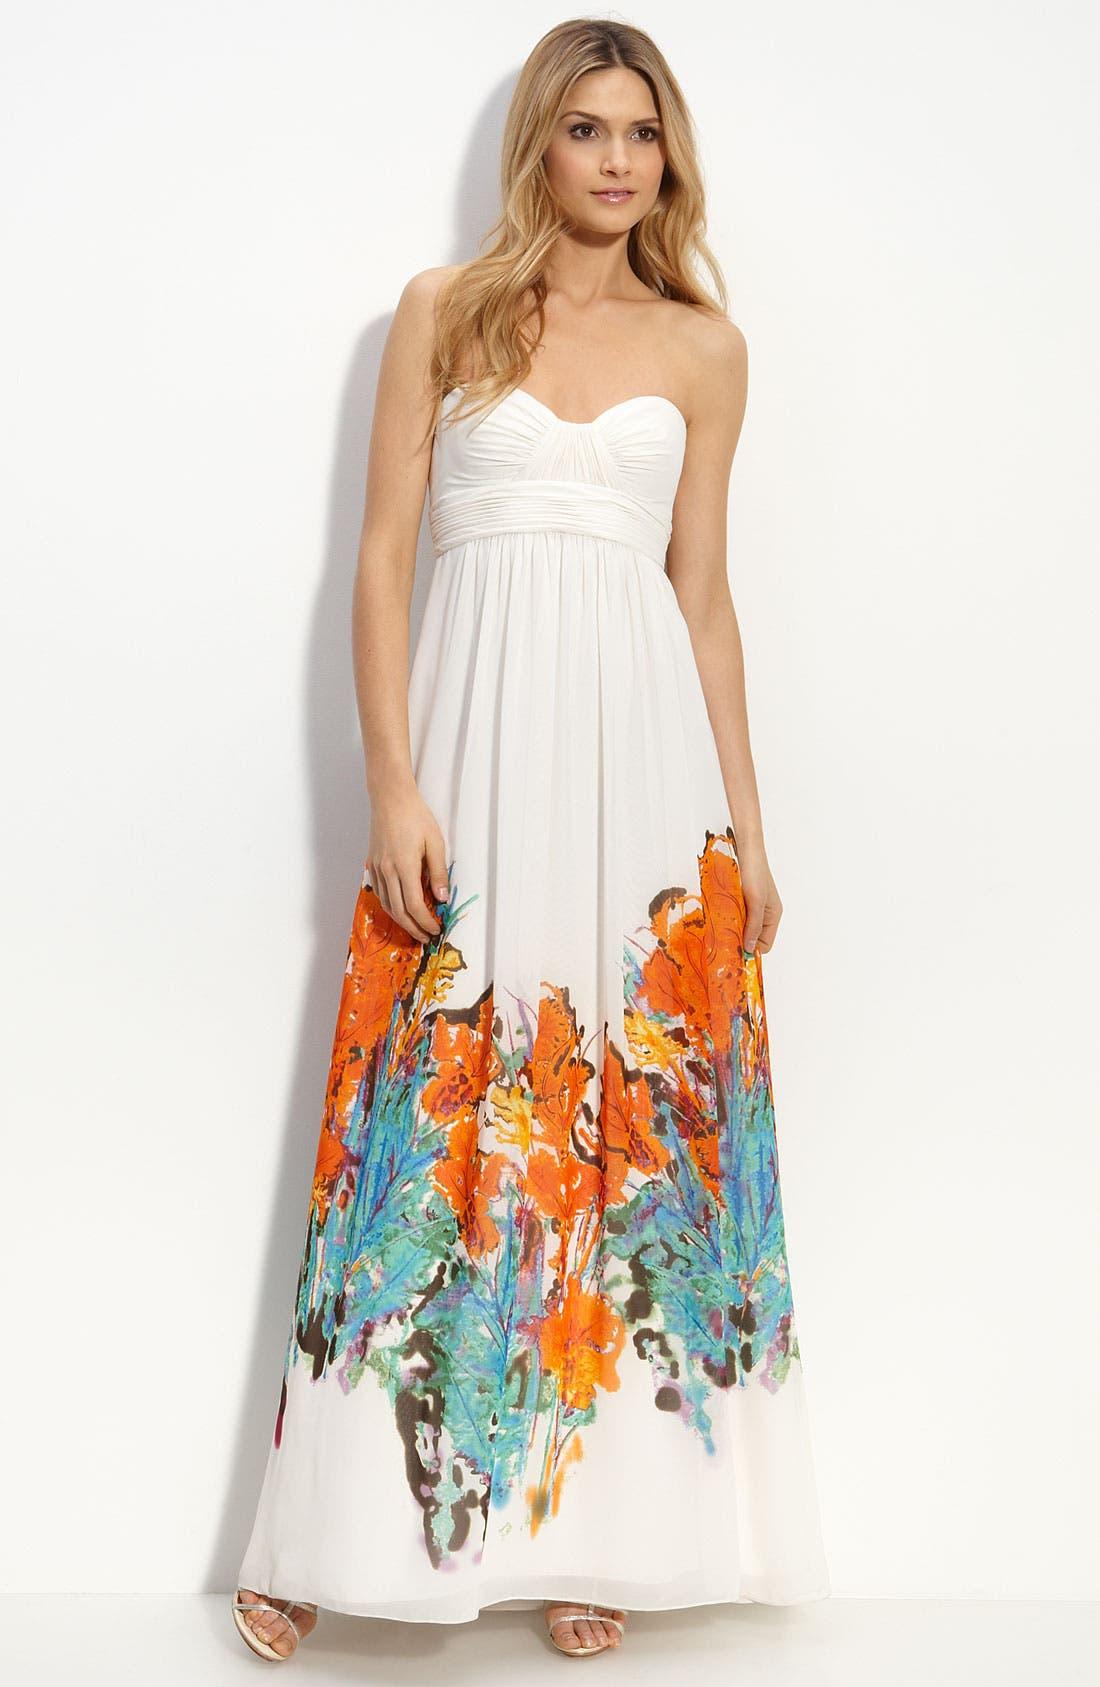 Alternate Image 1 Selected - Aidan Mattox Border Print Strapless Chiffon Dress